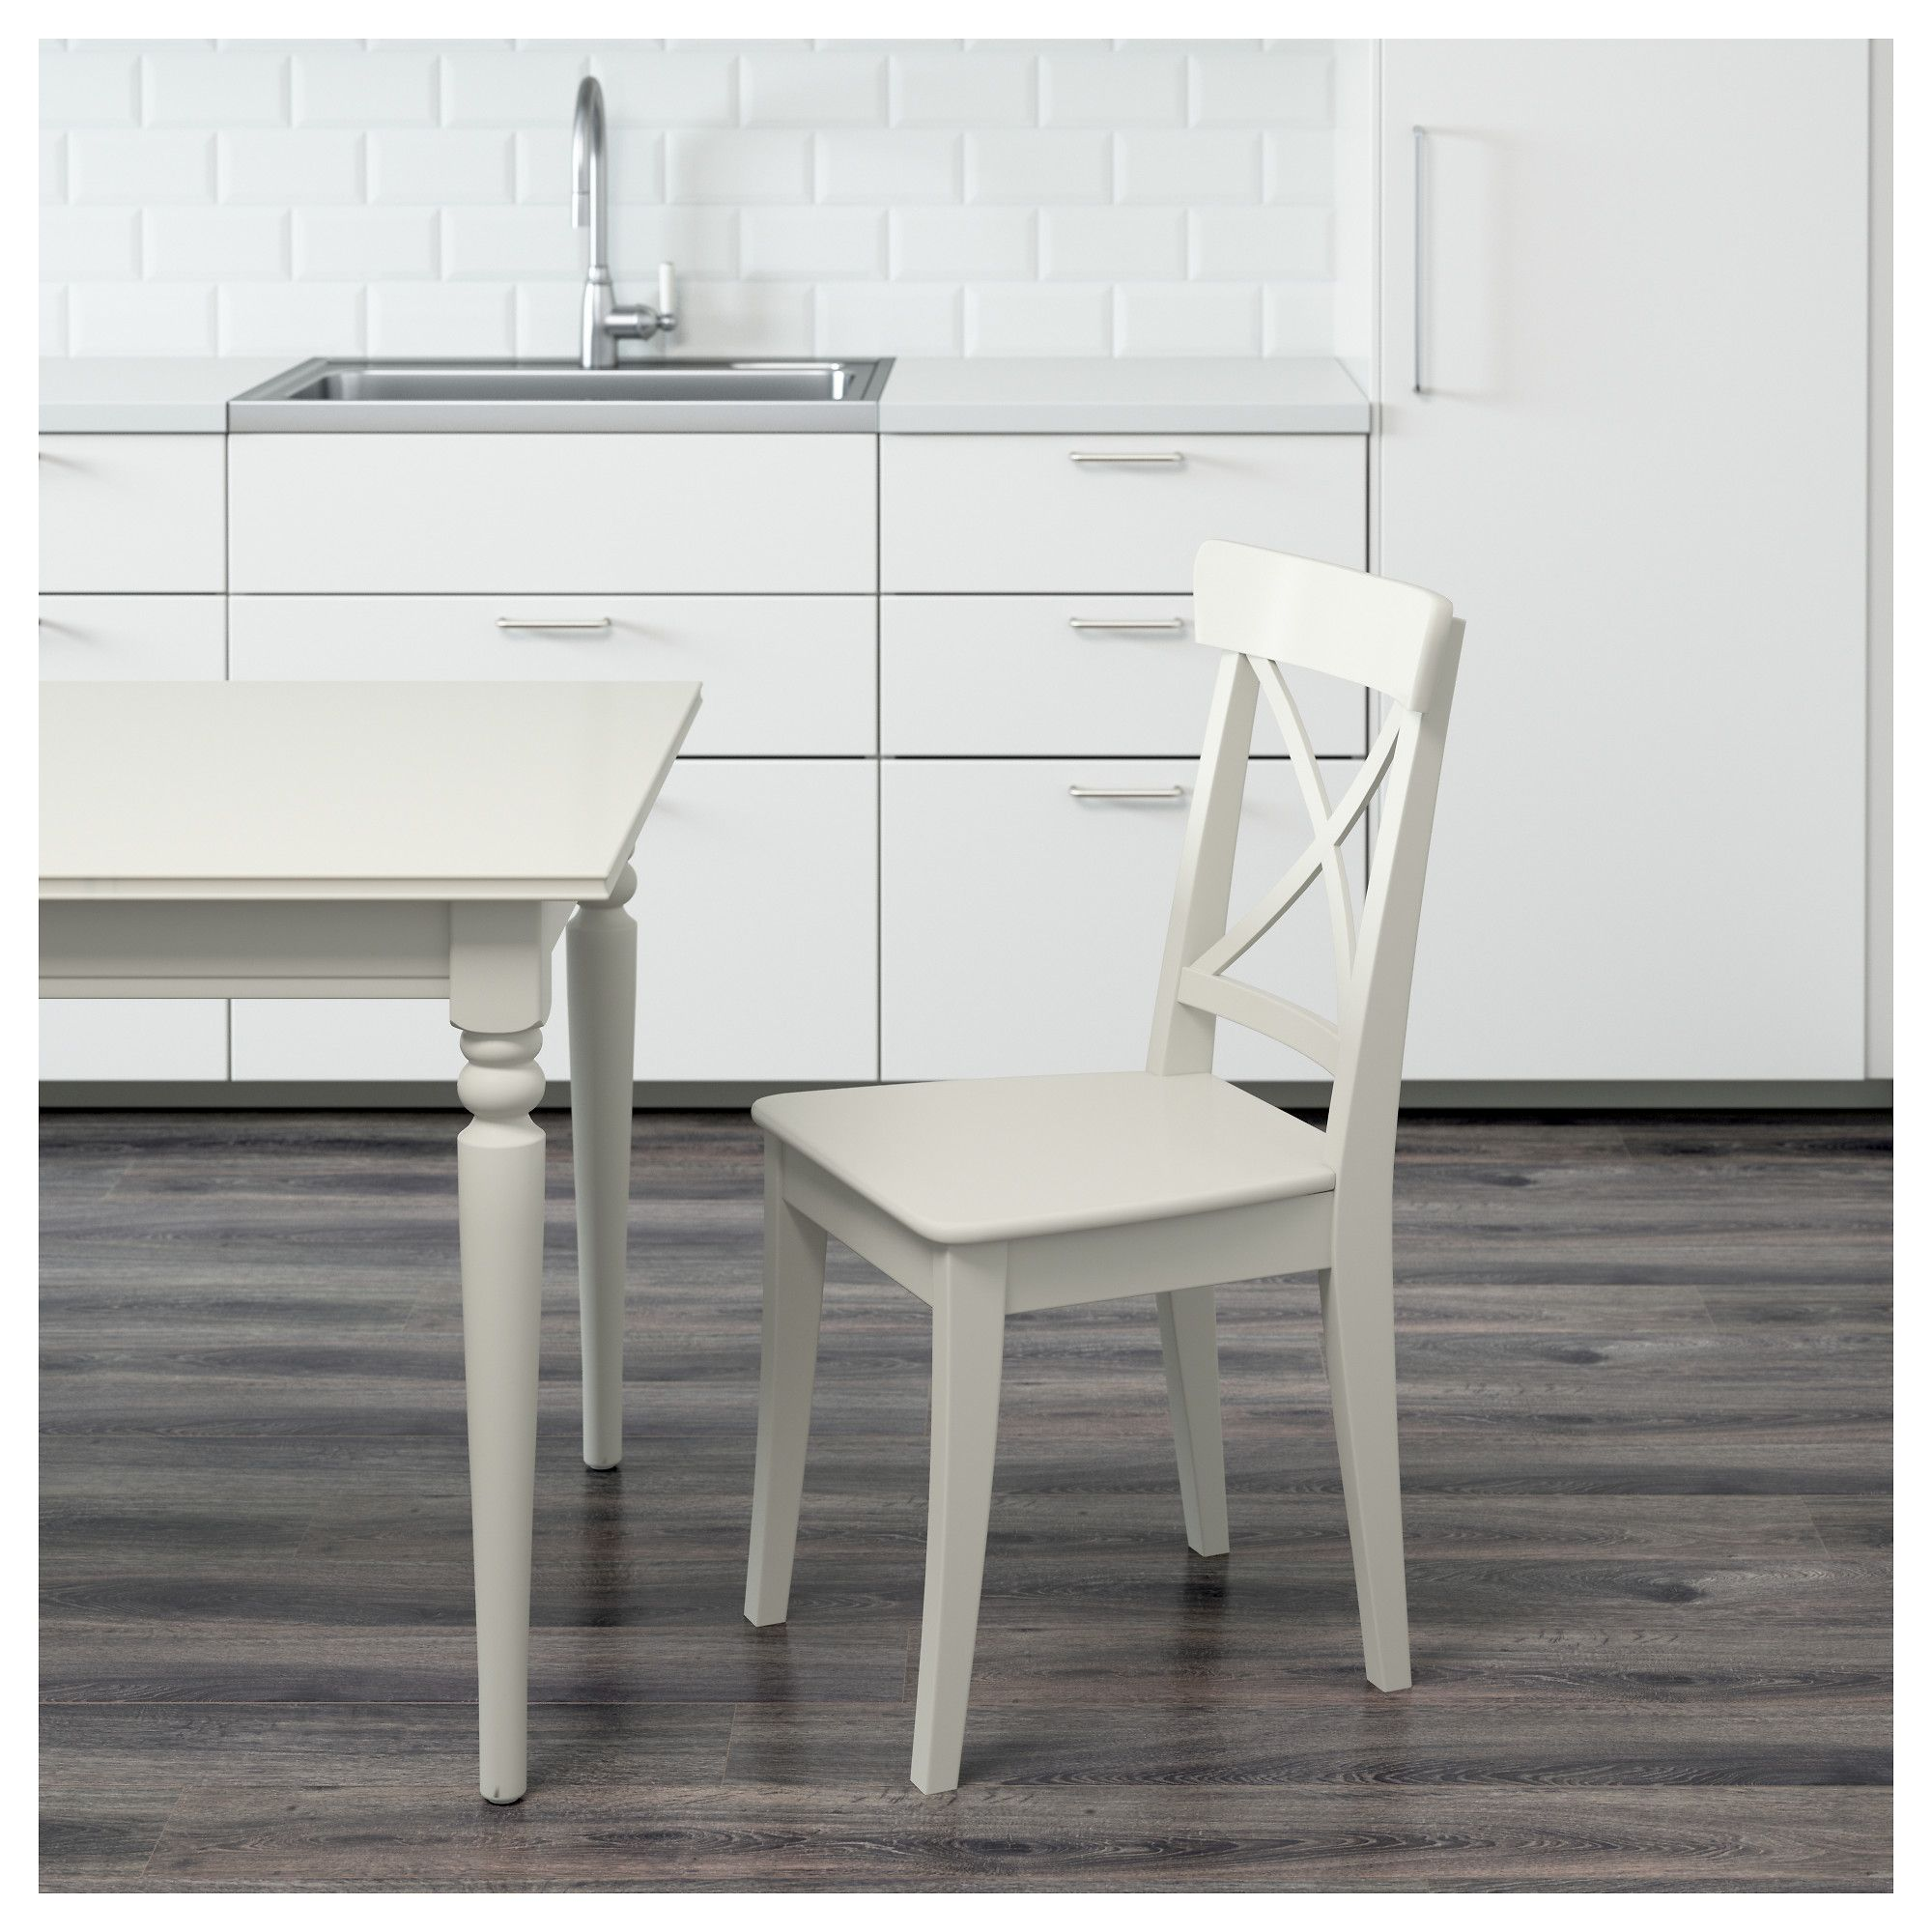 IKEA INGOLF Chair white Ikea, Ikea chair, Chair